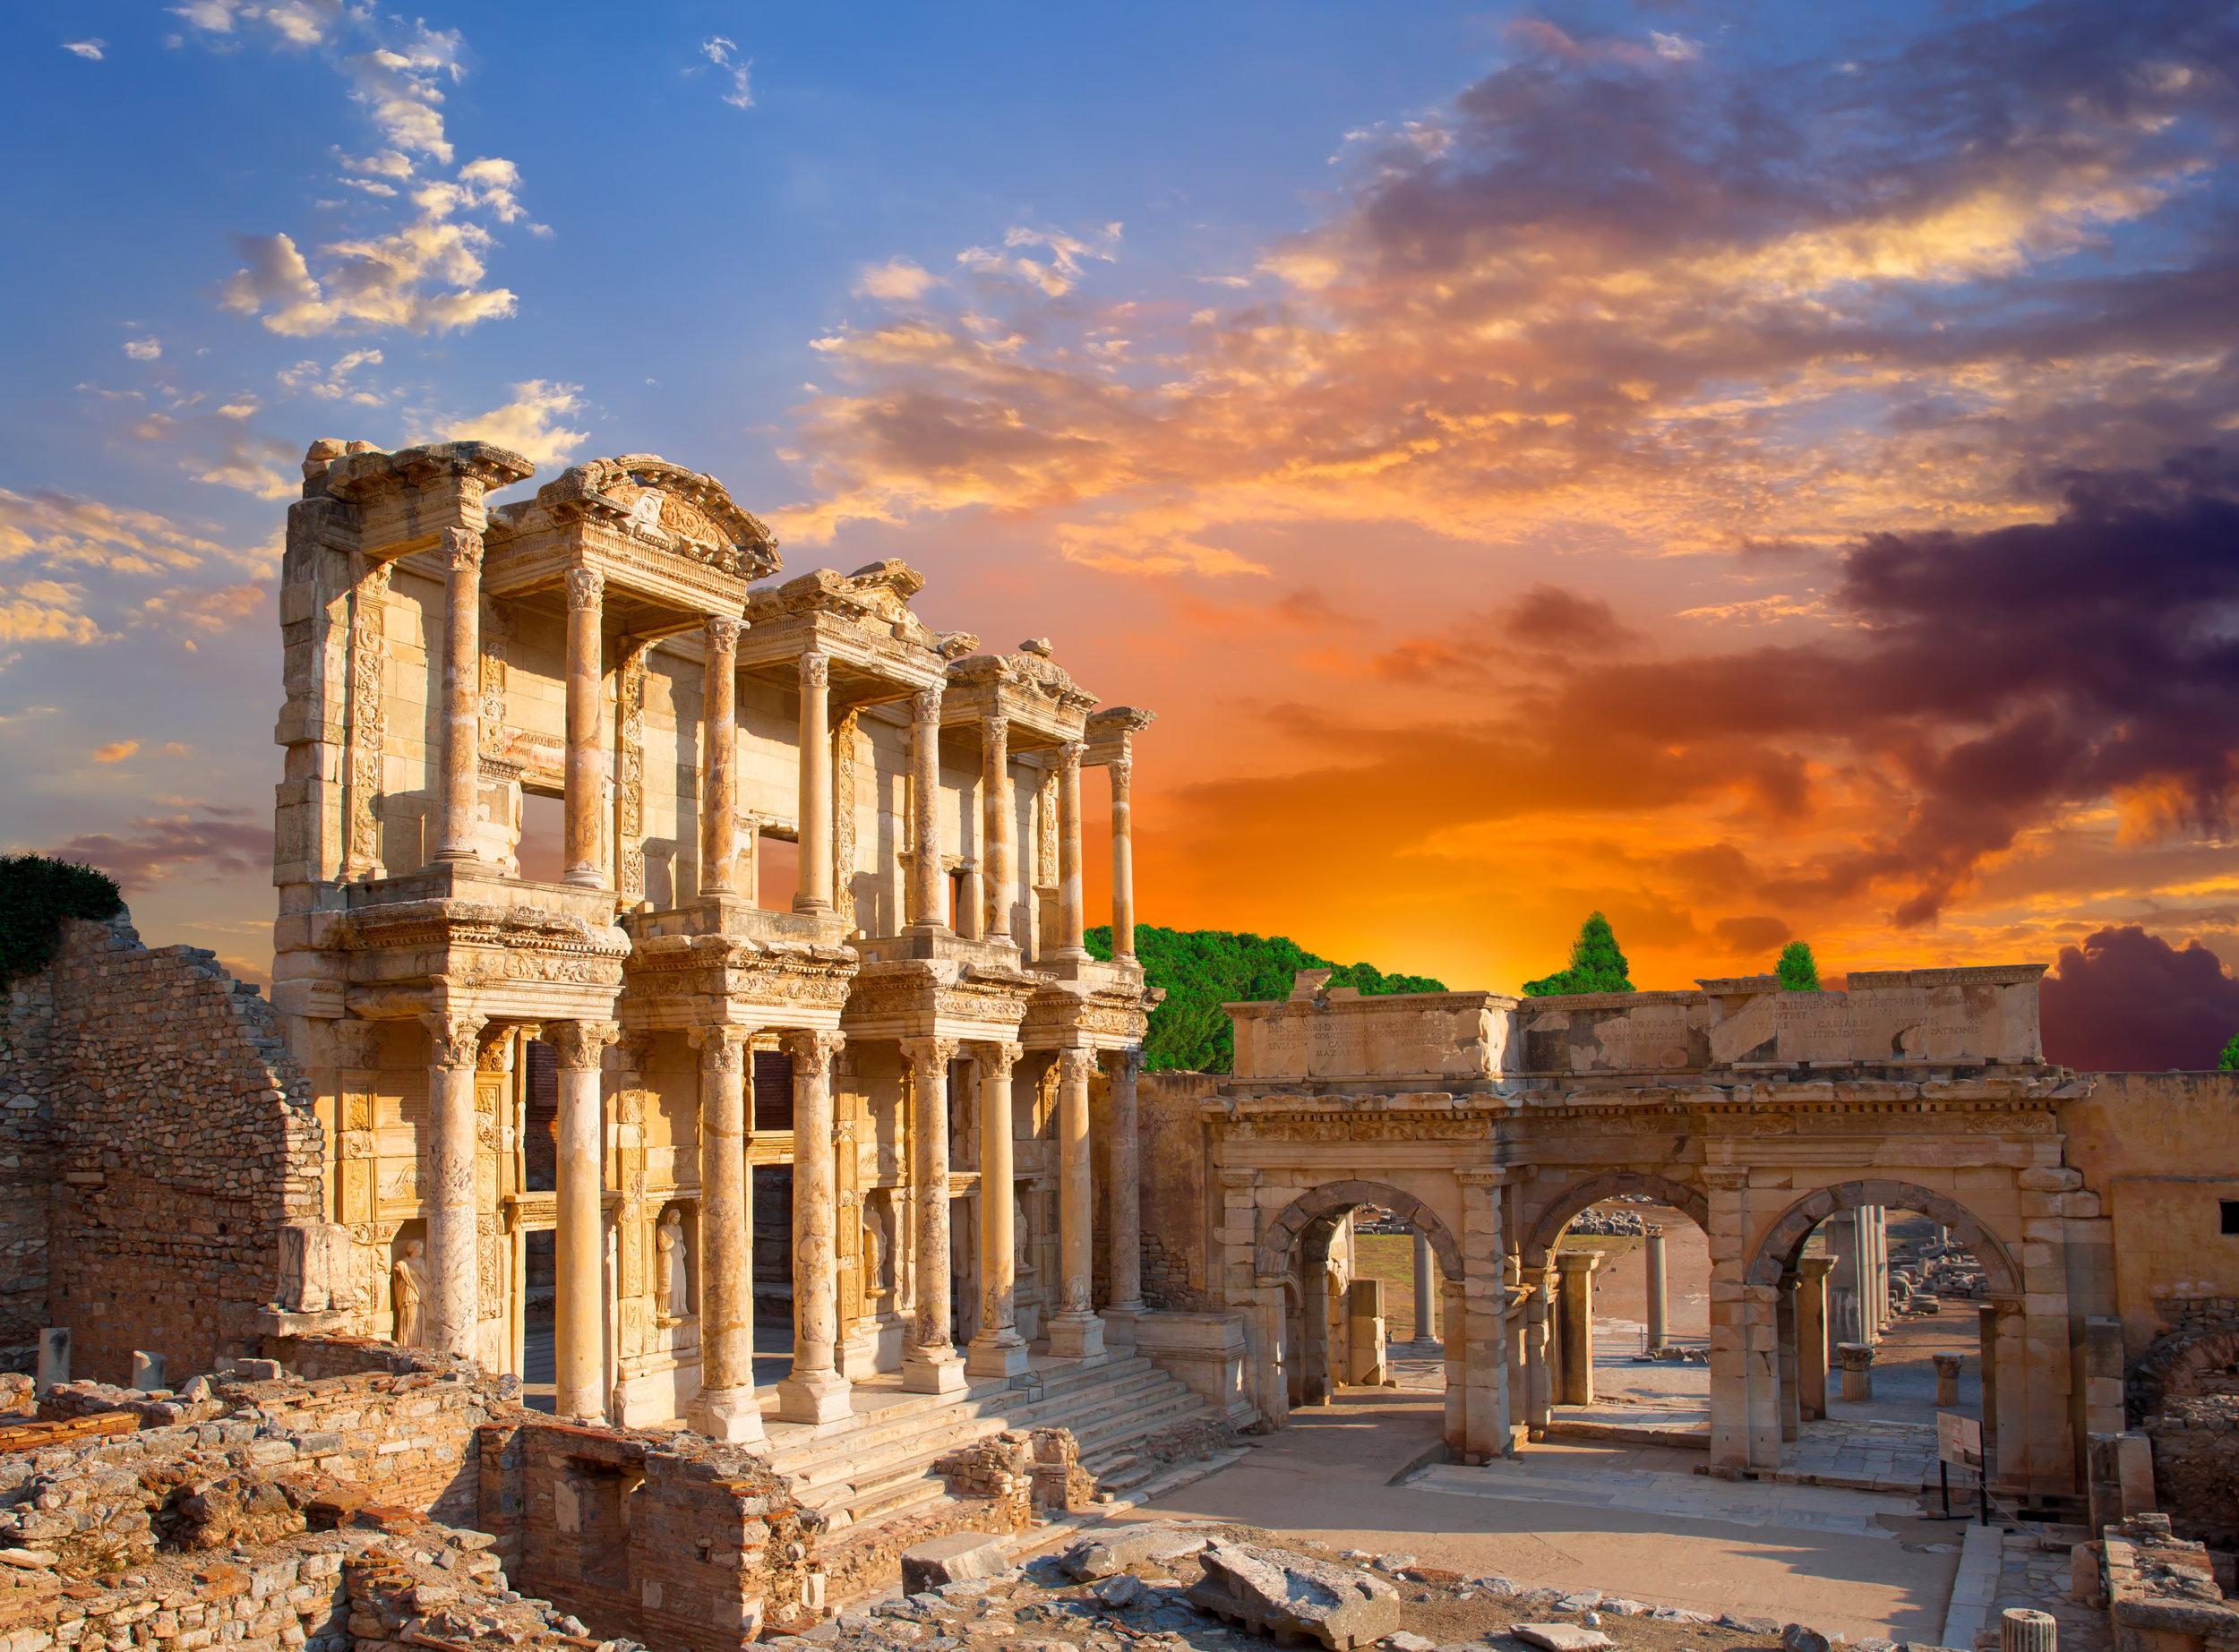 Library of Celsus Ephesus Turkey shutterstock_167371061.jpg